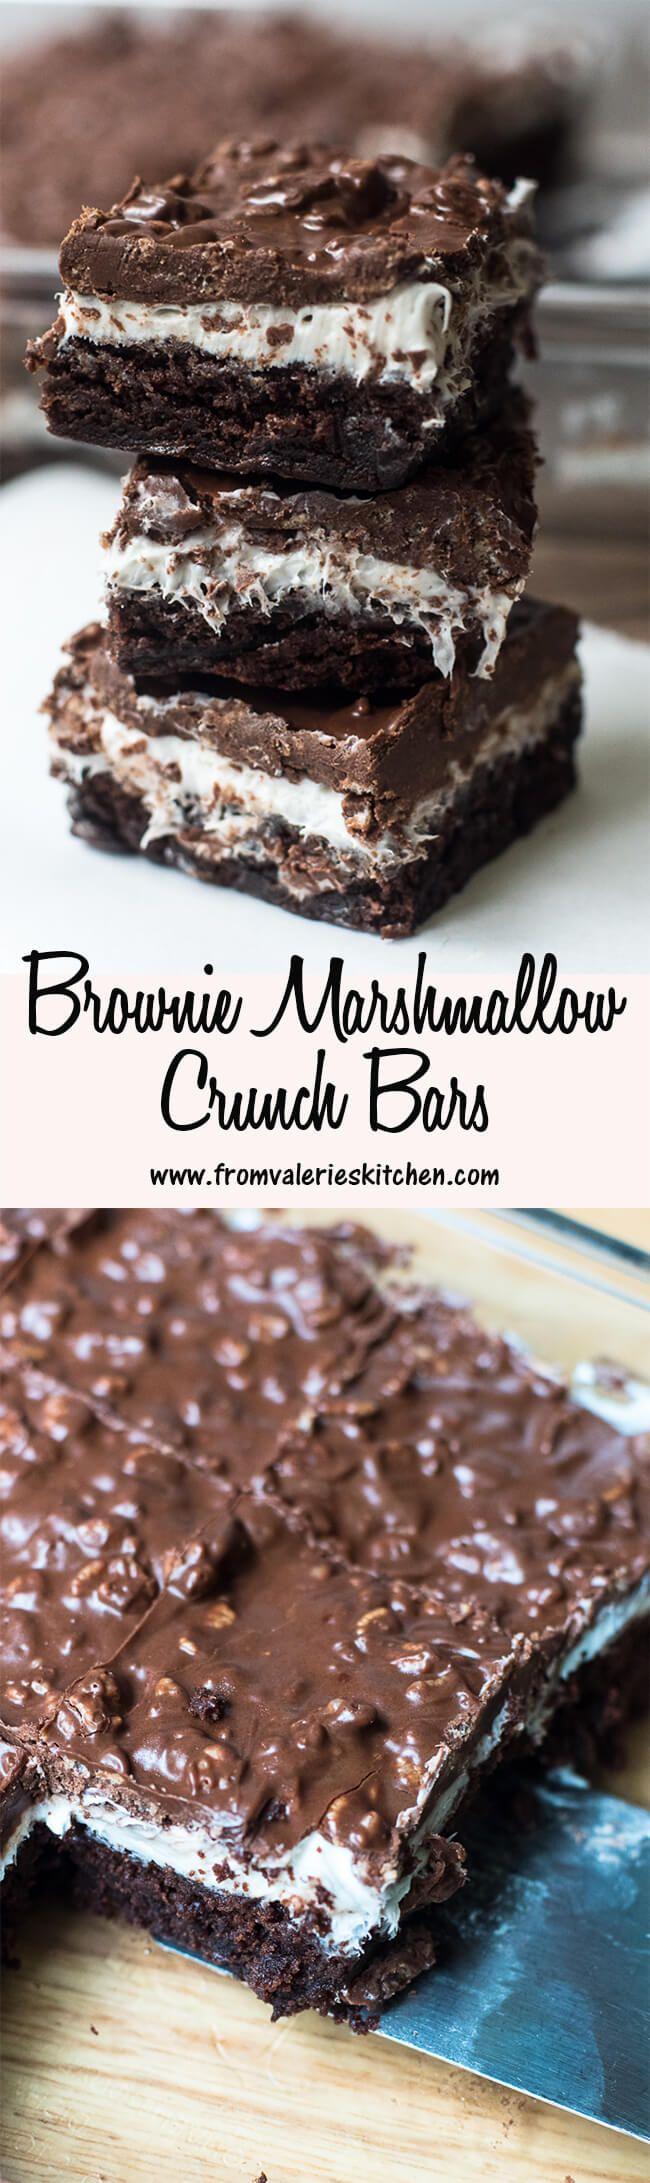 21+ Ways to Make Box Brownies Seem Gourmet! #marshmallow